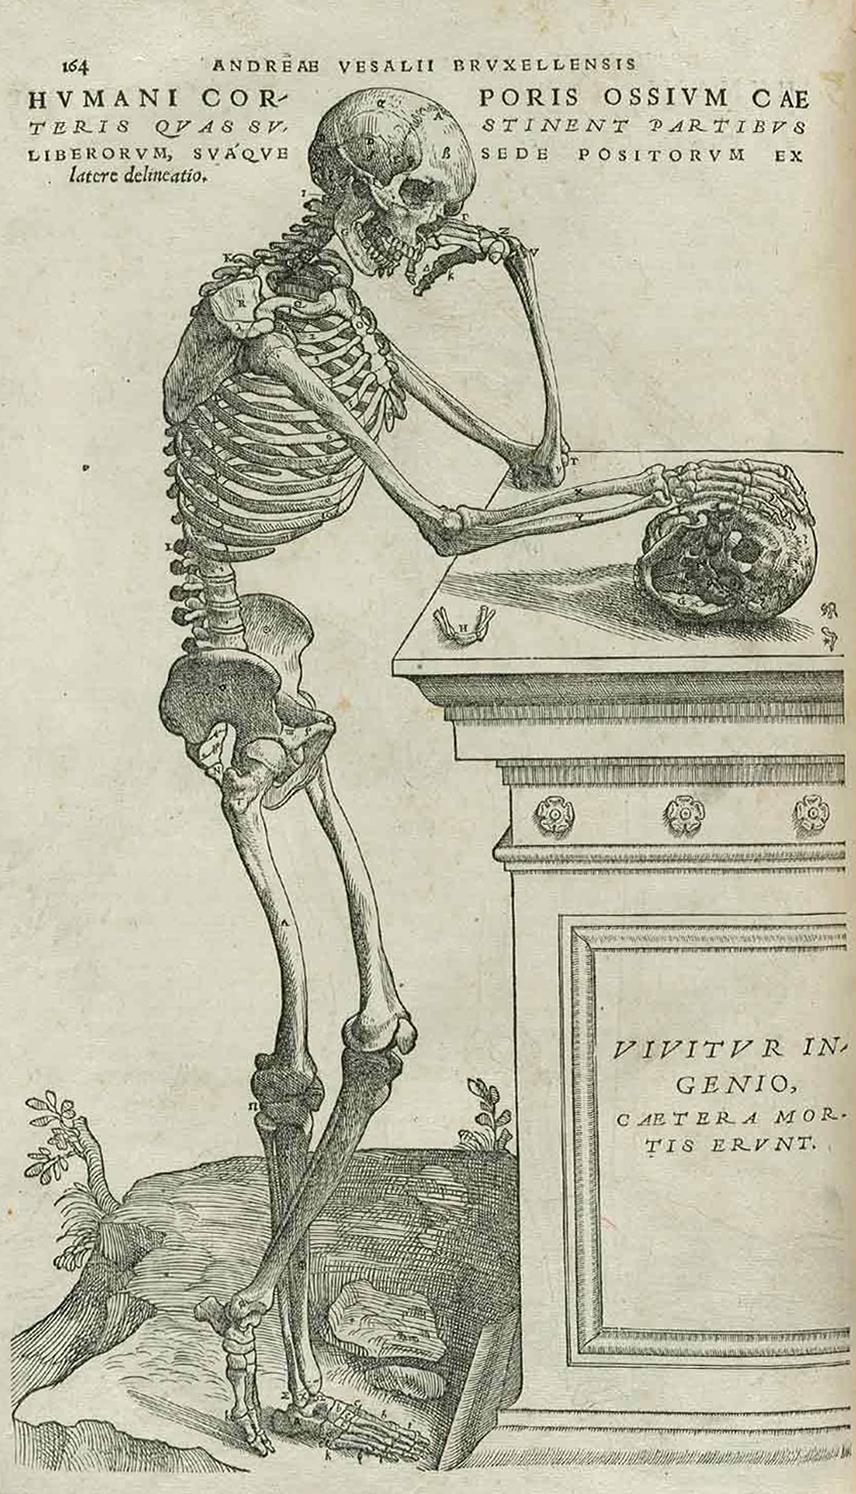 Image of a skeleton from Andreas Vesalius, De humani corporis fabrica libri septem (Basel, 1555)